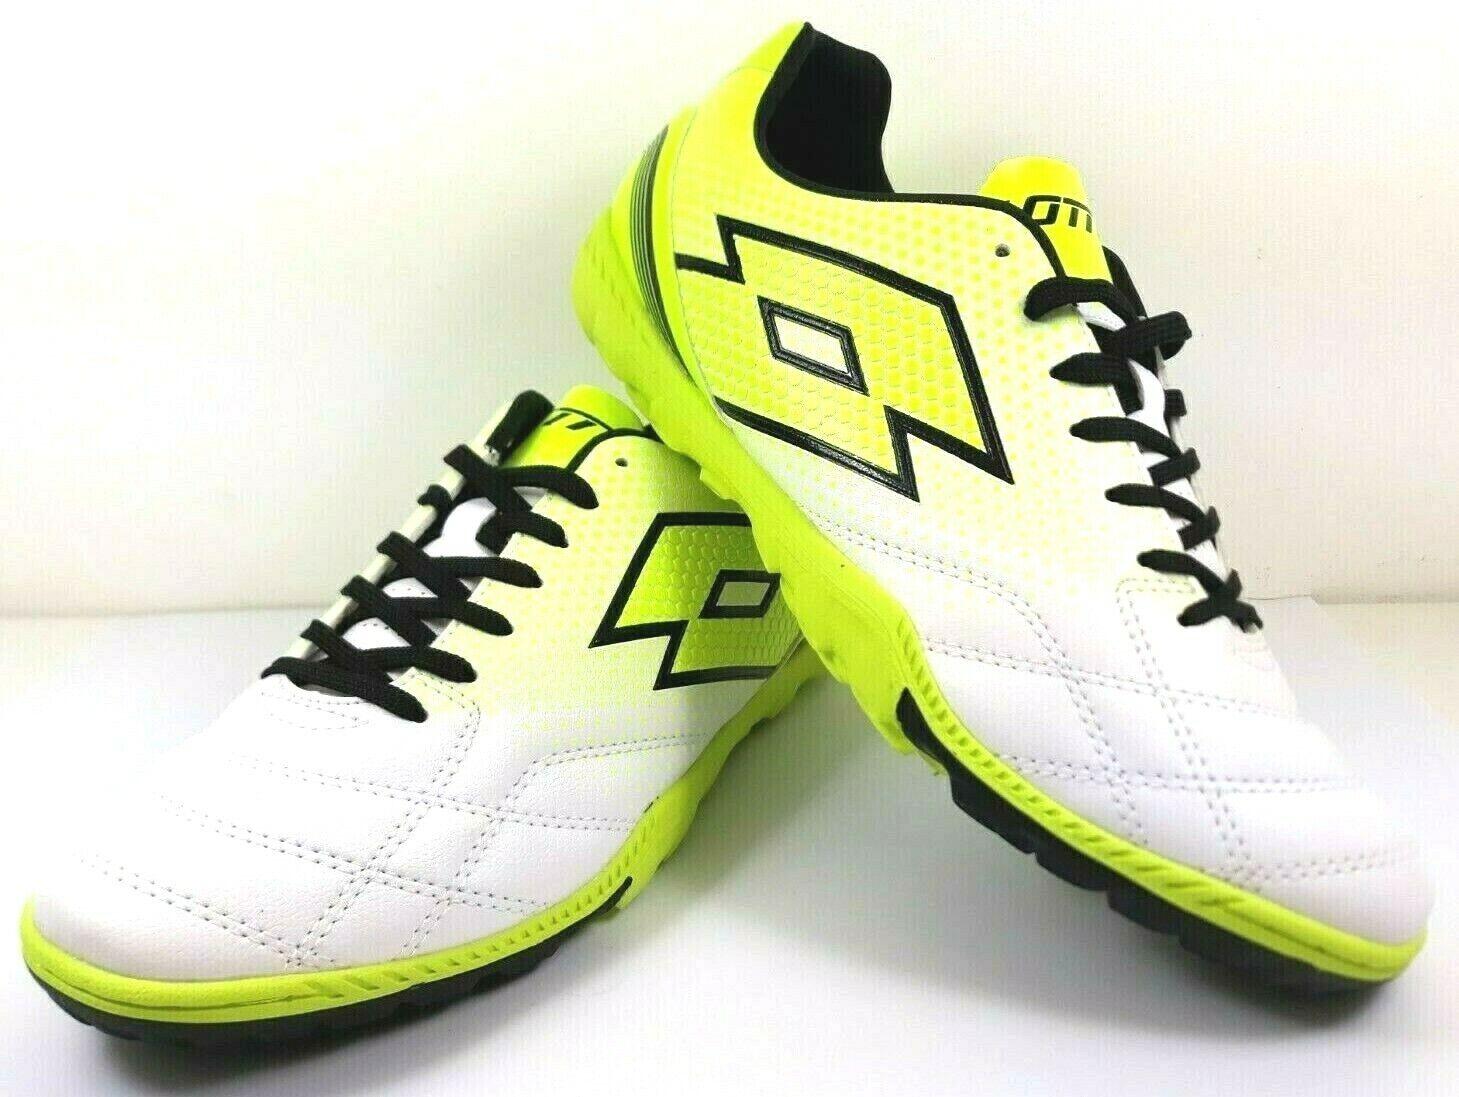 Lotto spider 700 xiii tf football shoes futsal indoor EUR 41 uk 7,5